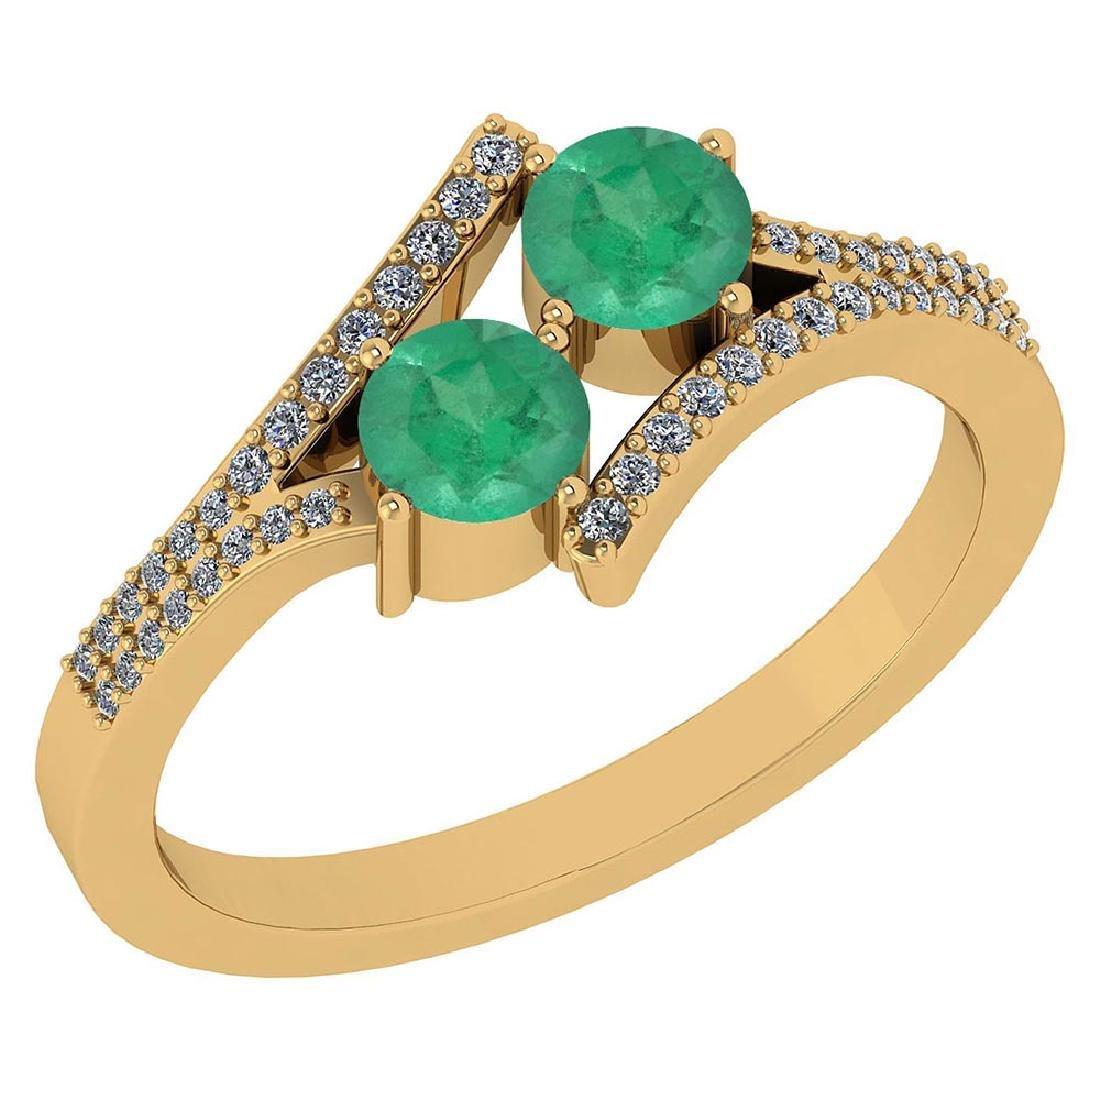 Certified 1.06 Ctw Genuine Emerald And Diamond 14k Yell